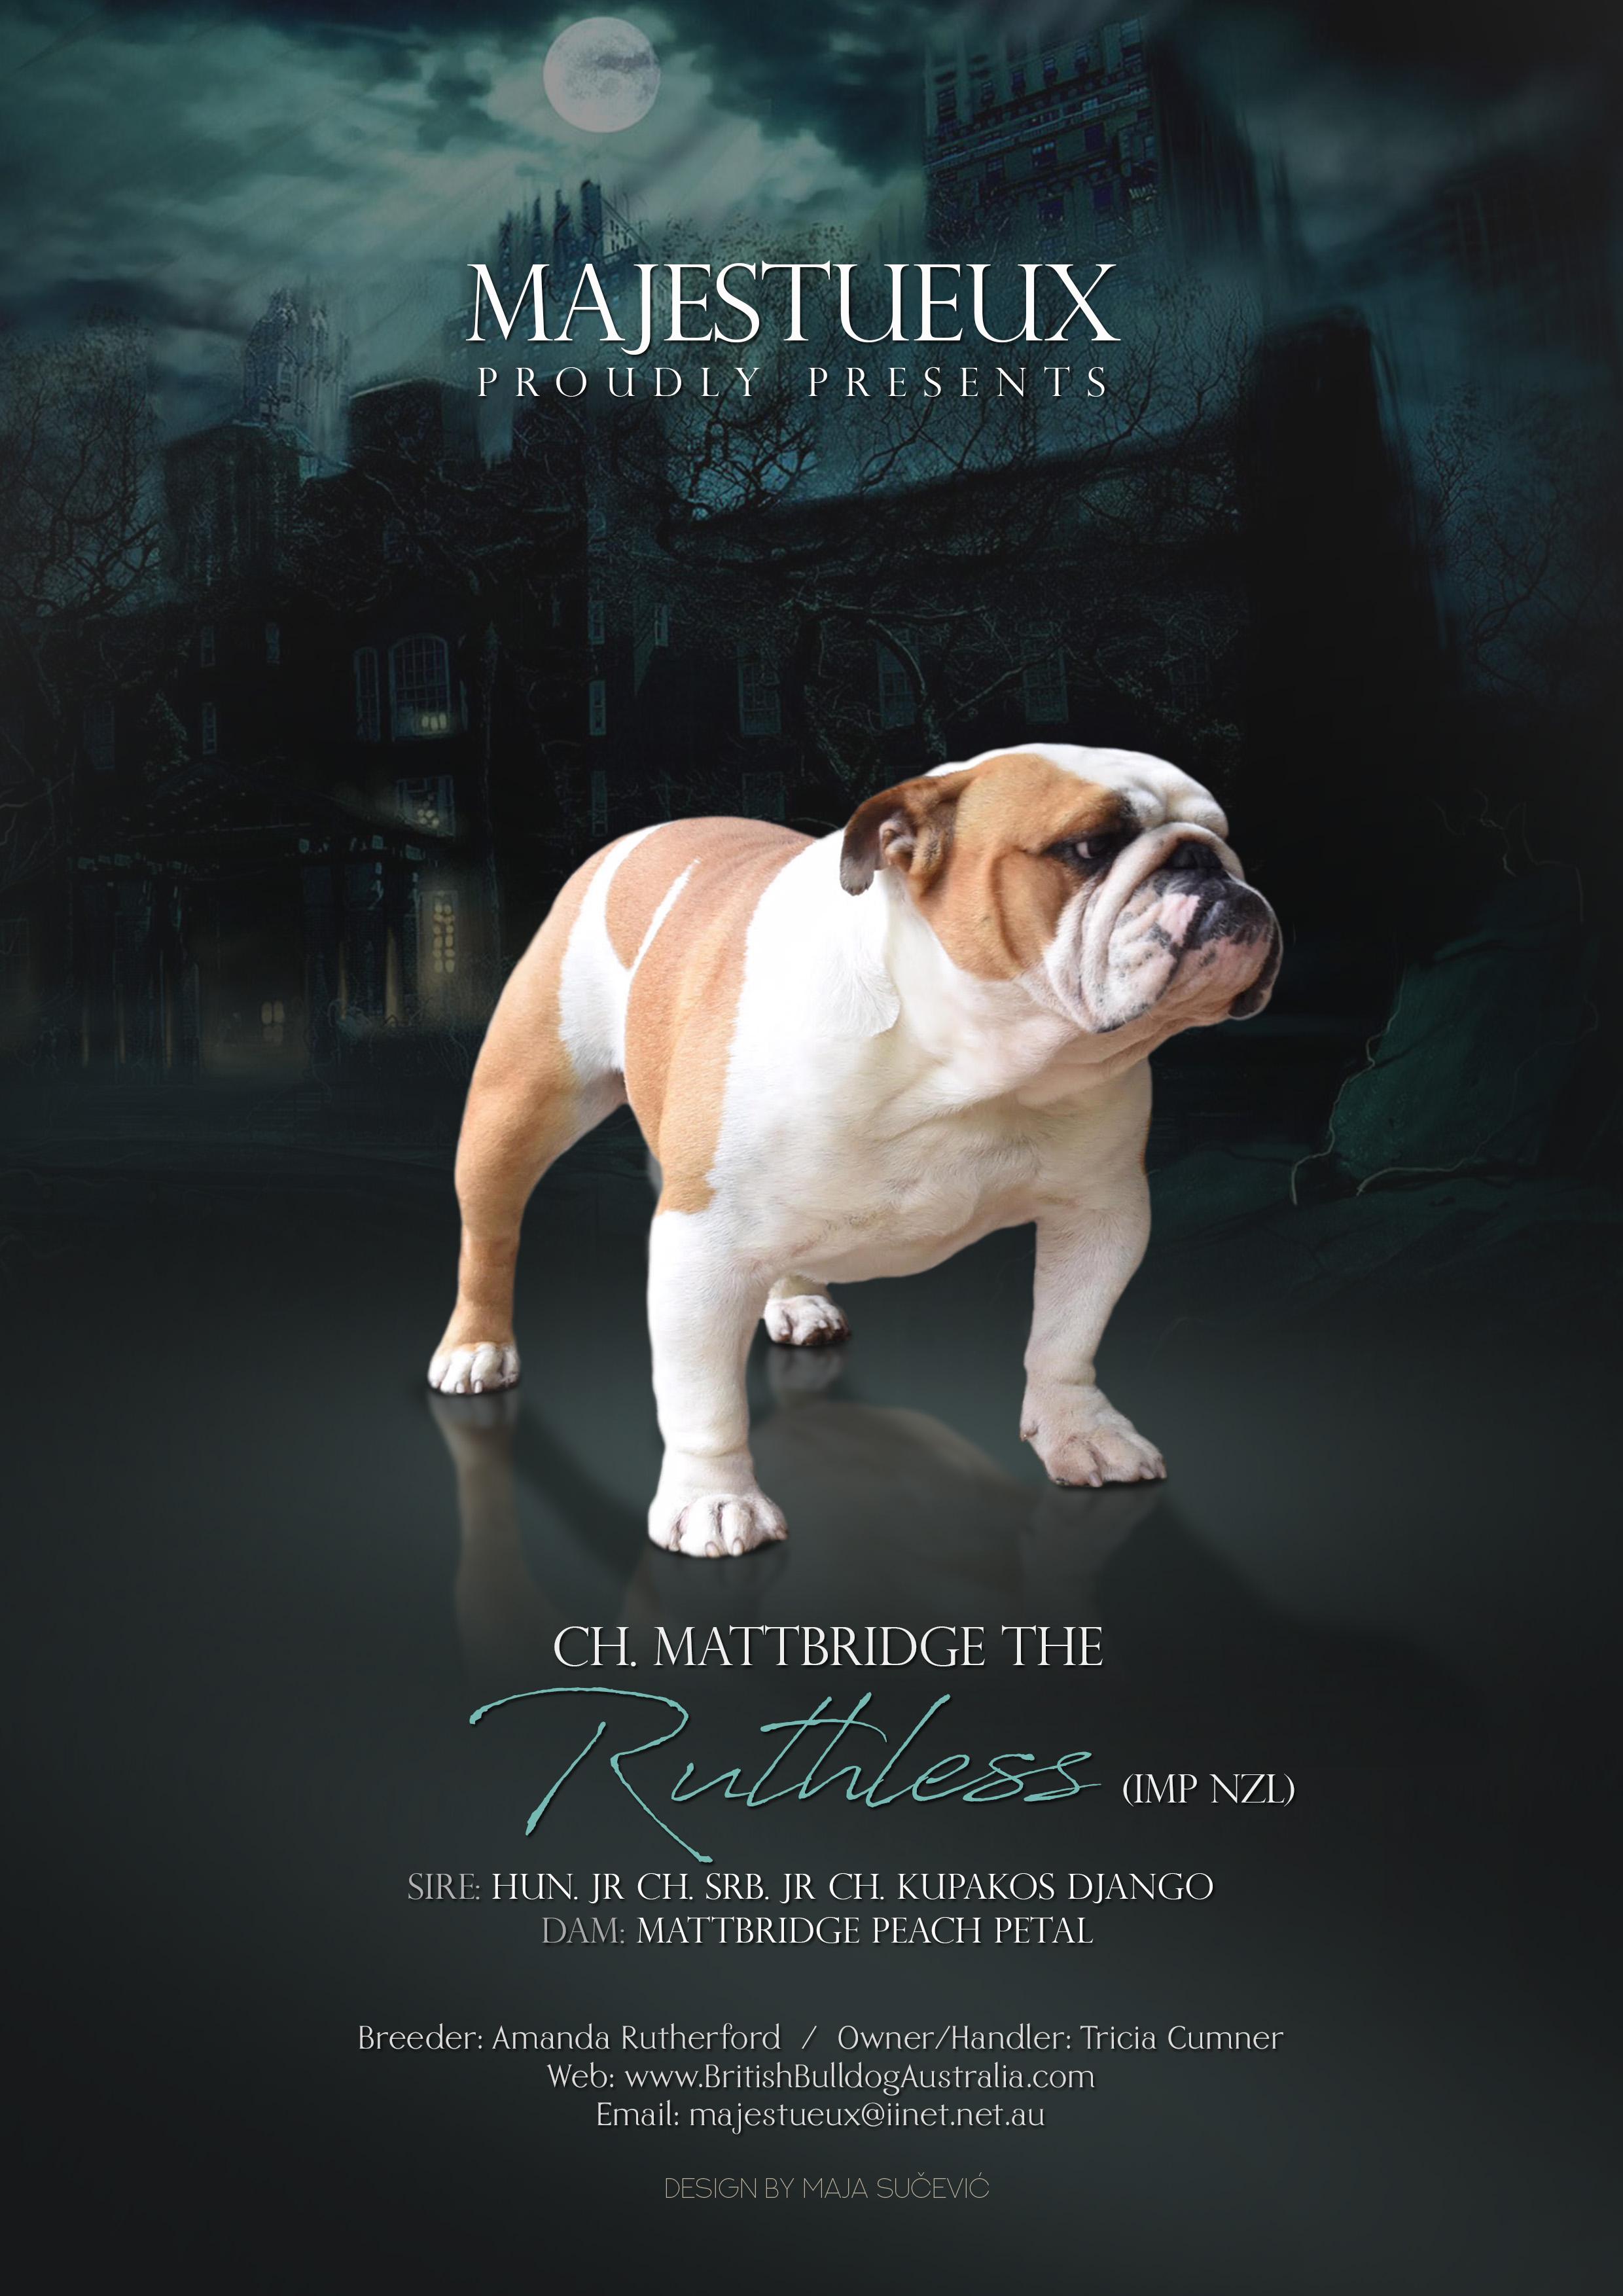 Ch. Mattbridge The Ruthless (Imp NZL) gallery image